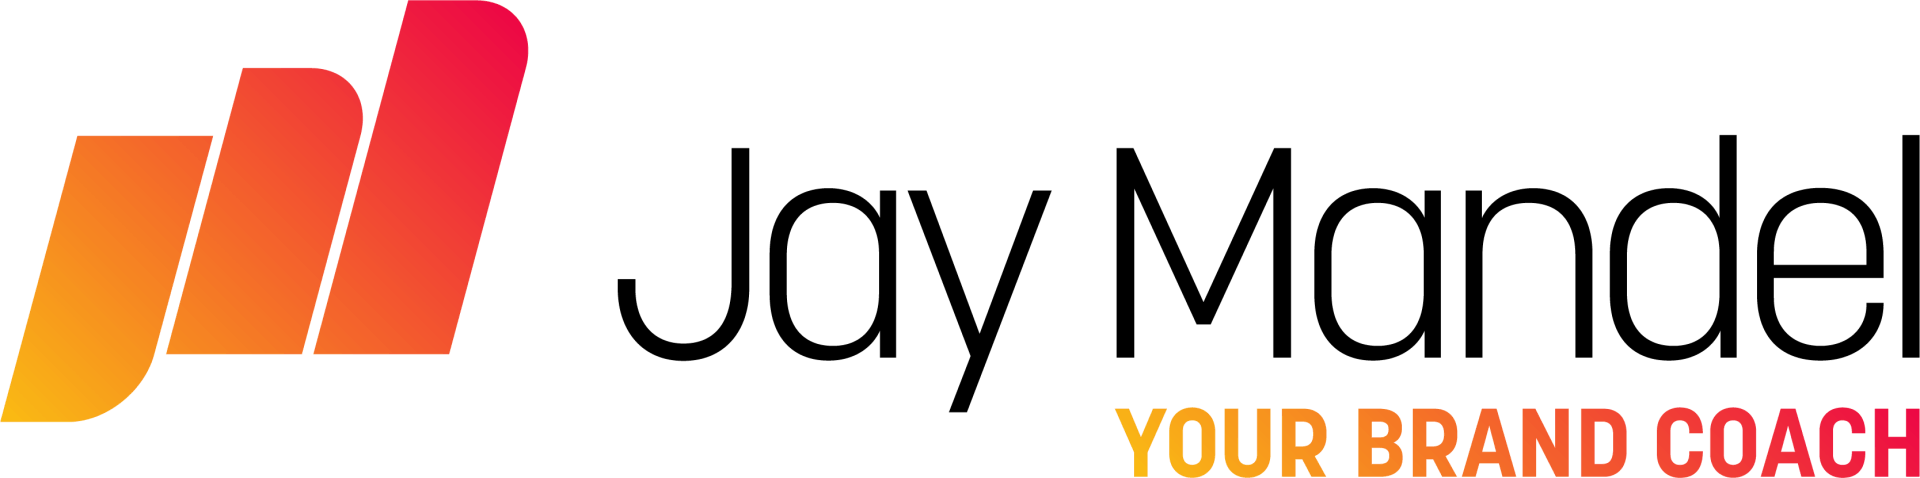 Jay Mandel, Your Brand Coach